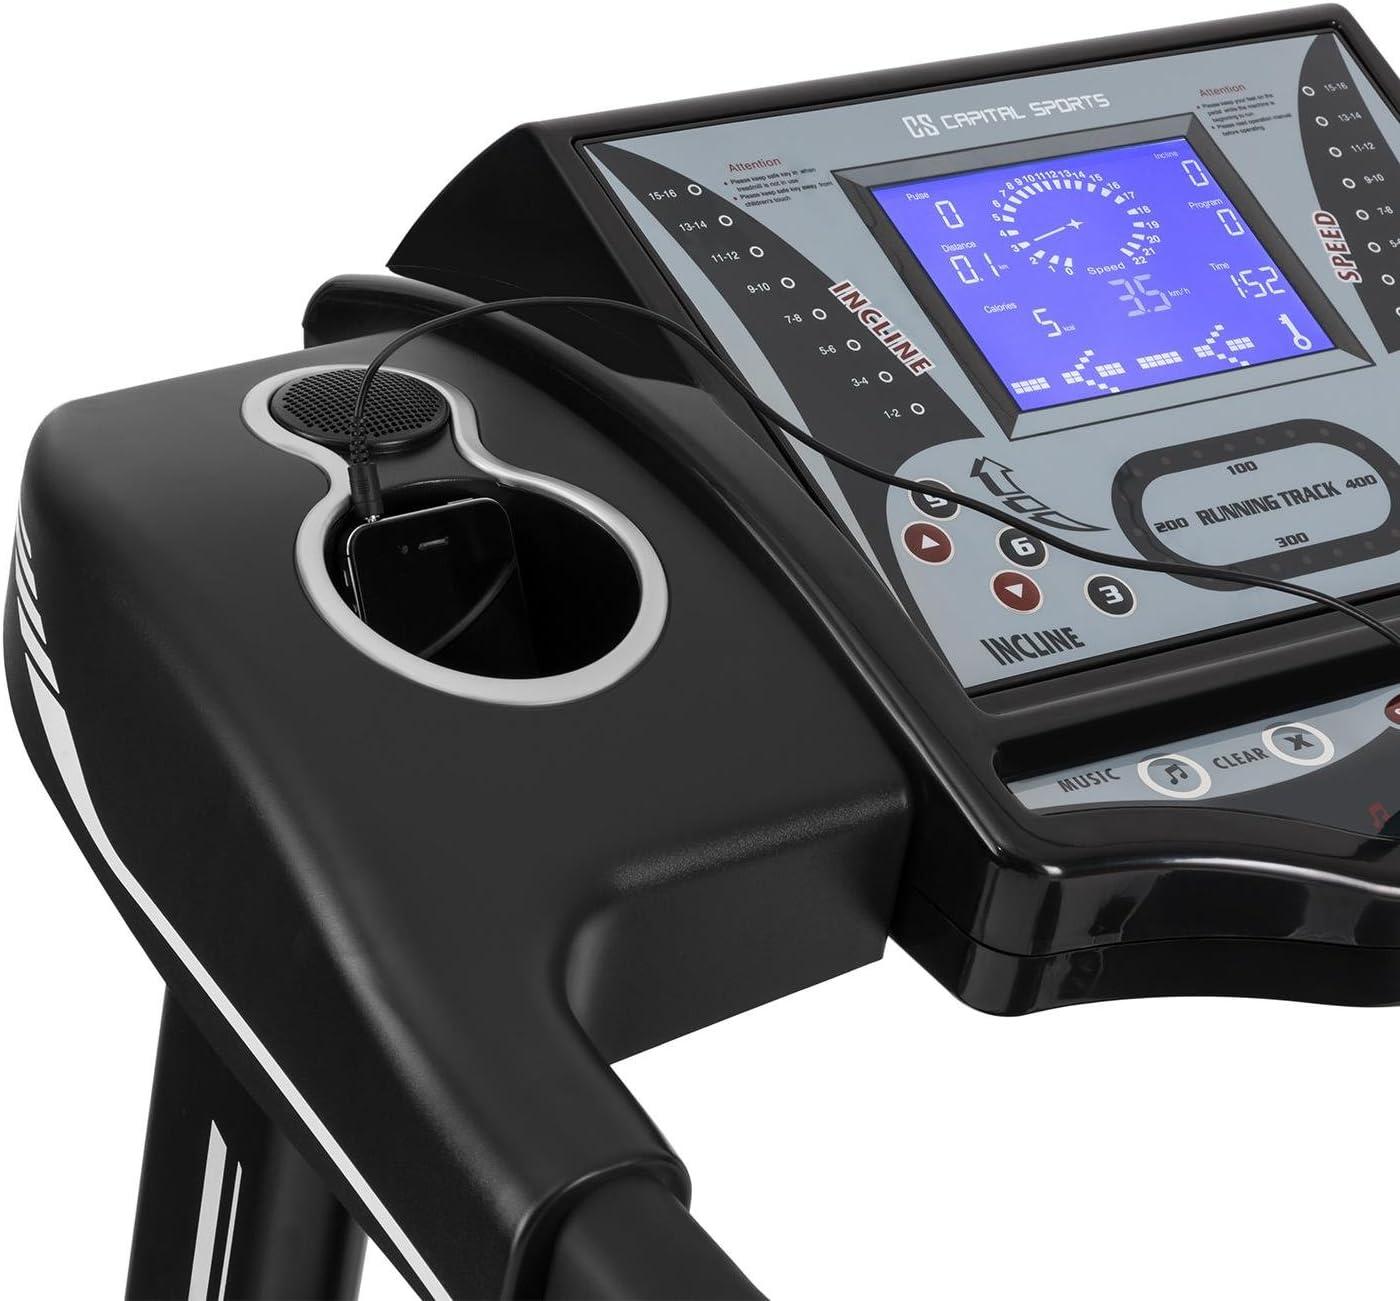 CAPITAL SPORTS Pacemaker X55 - caminadora , cinta de correr ...